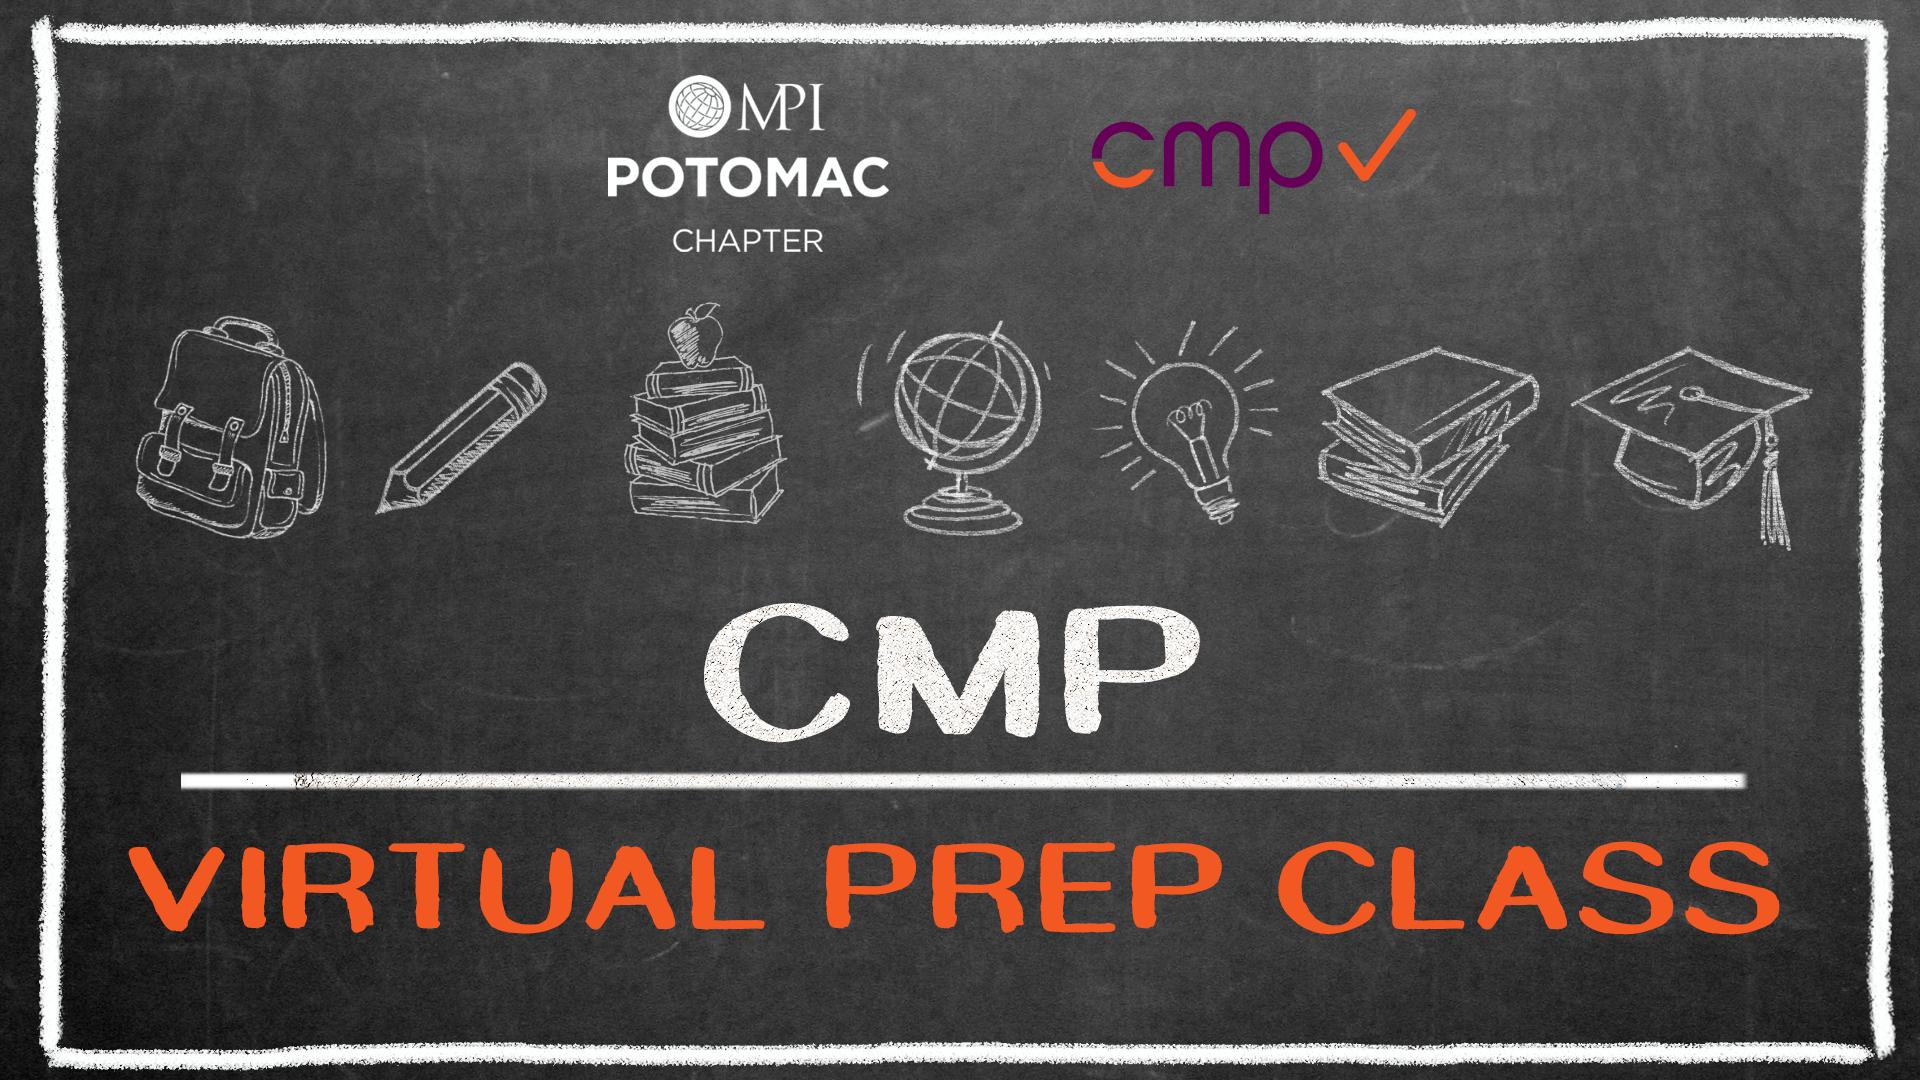 MPI Potomac CMP Virtual Preparation Class – Summer 2020